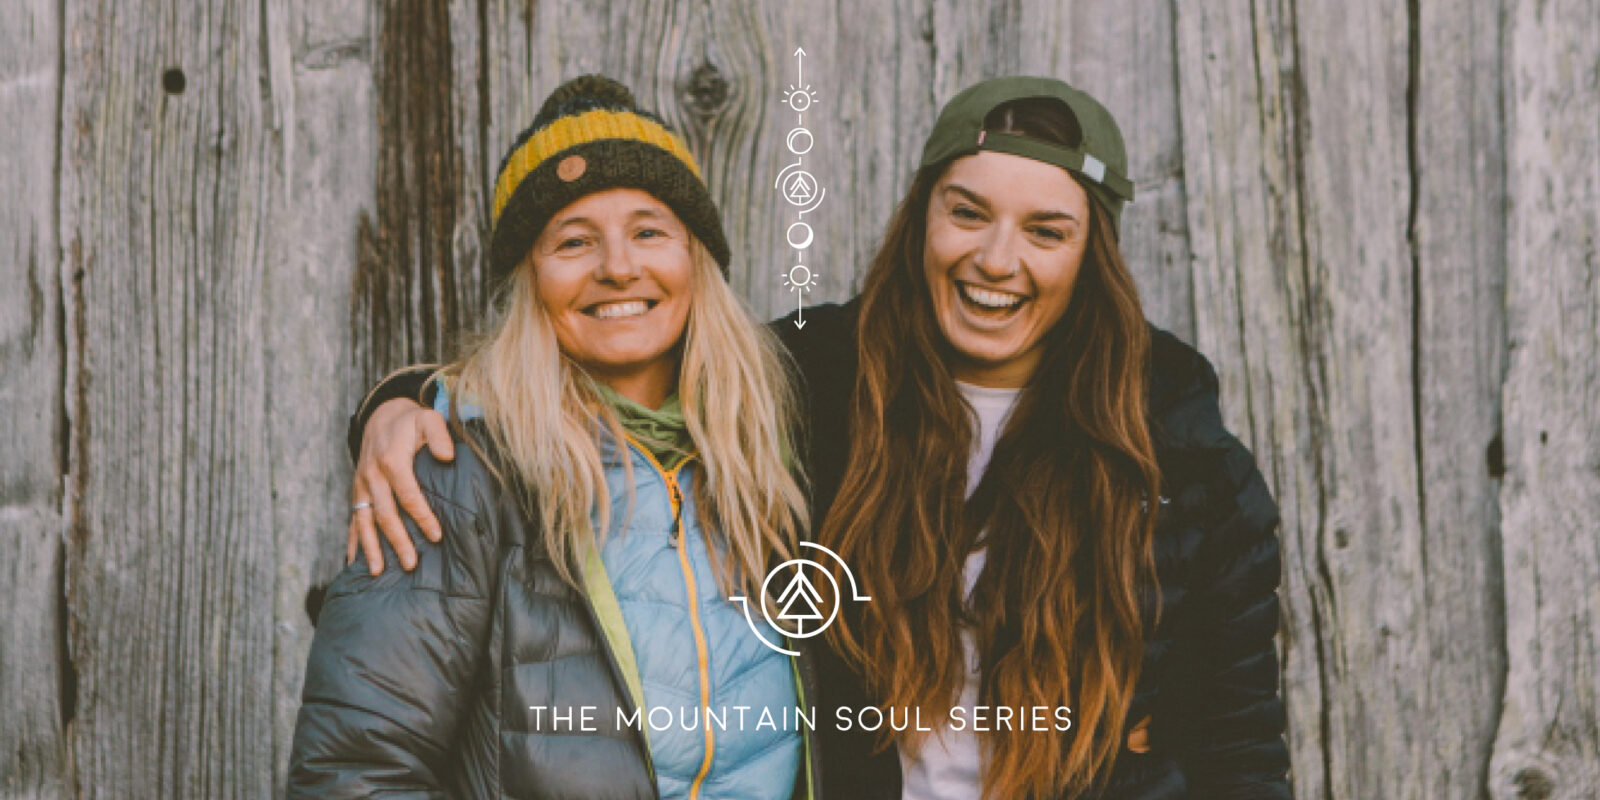 The Mountain Soul Series